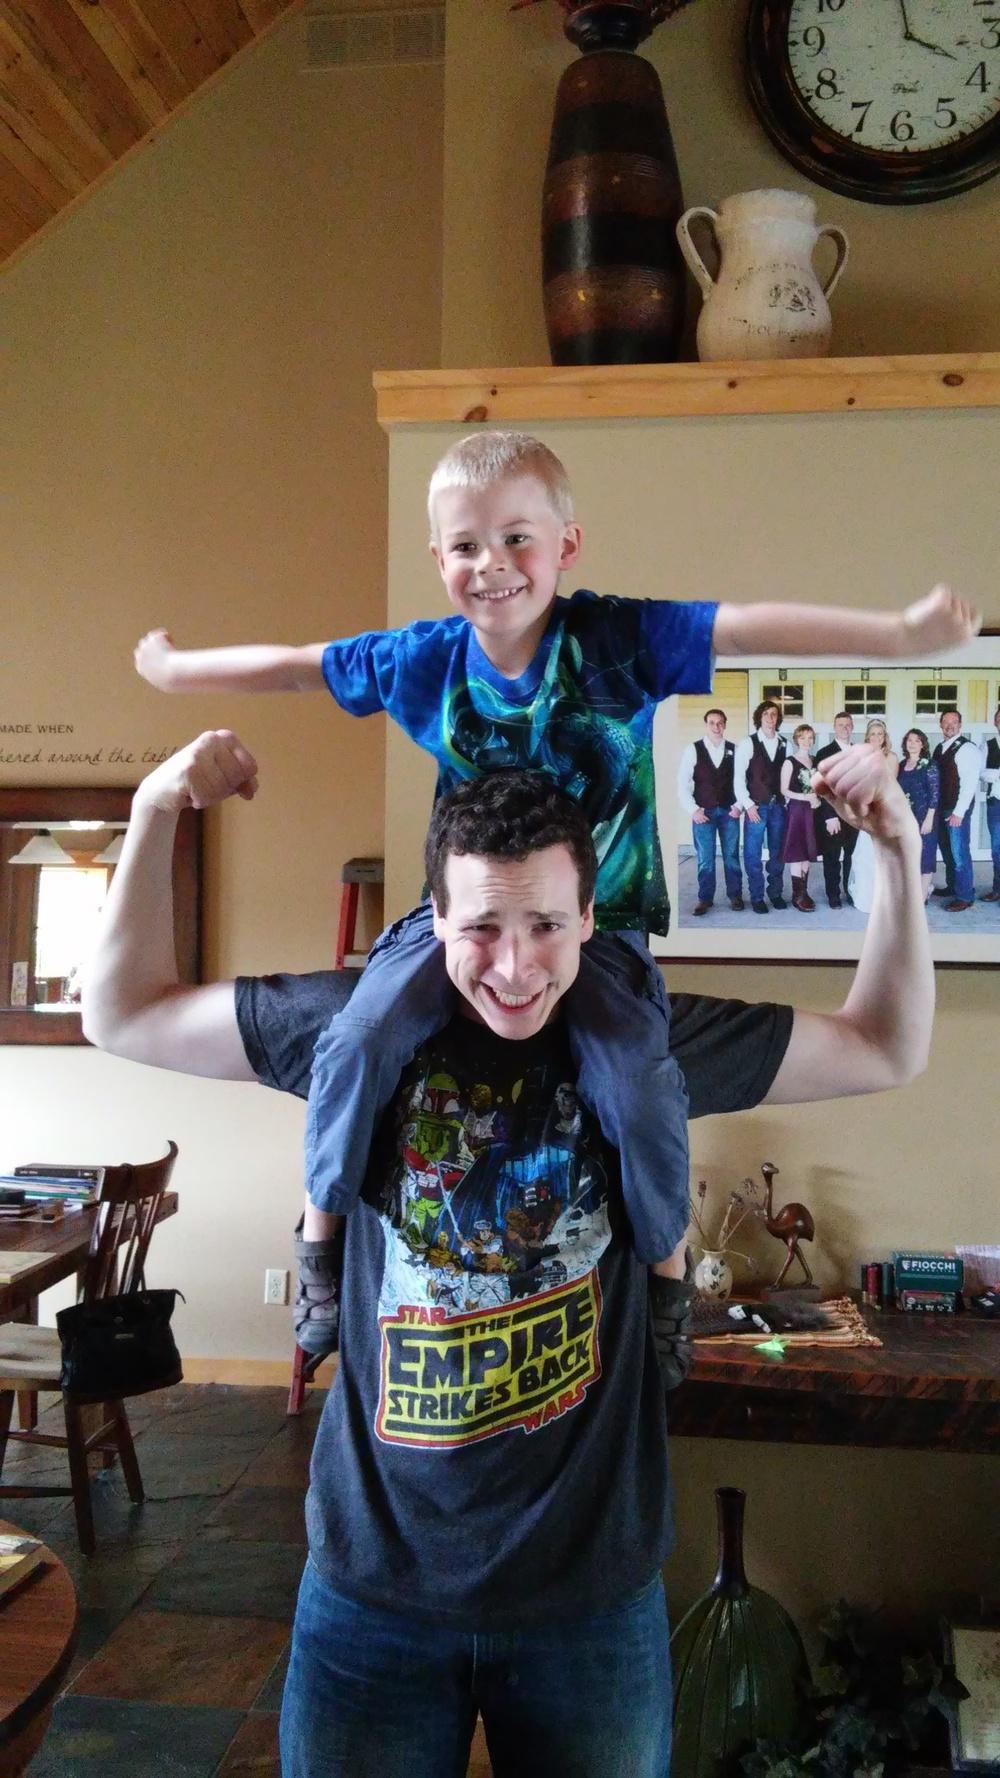 Chad and Ewan rocking their new Star Wars shirts.